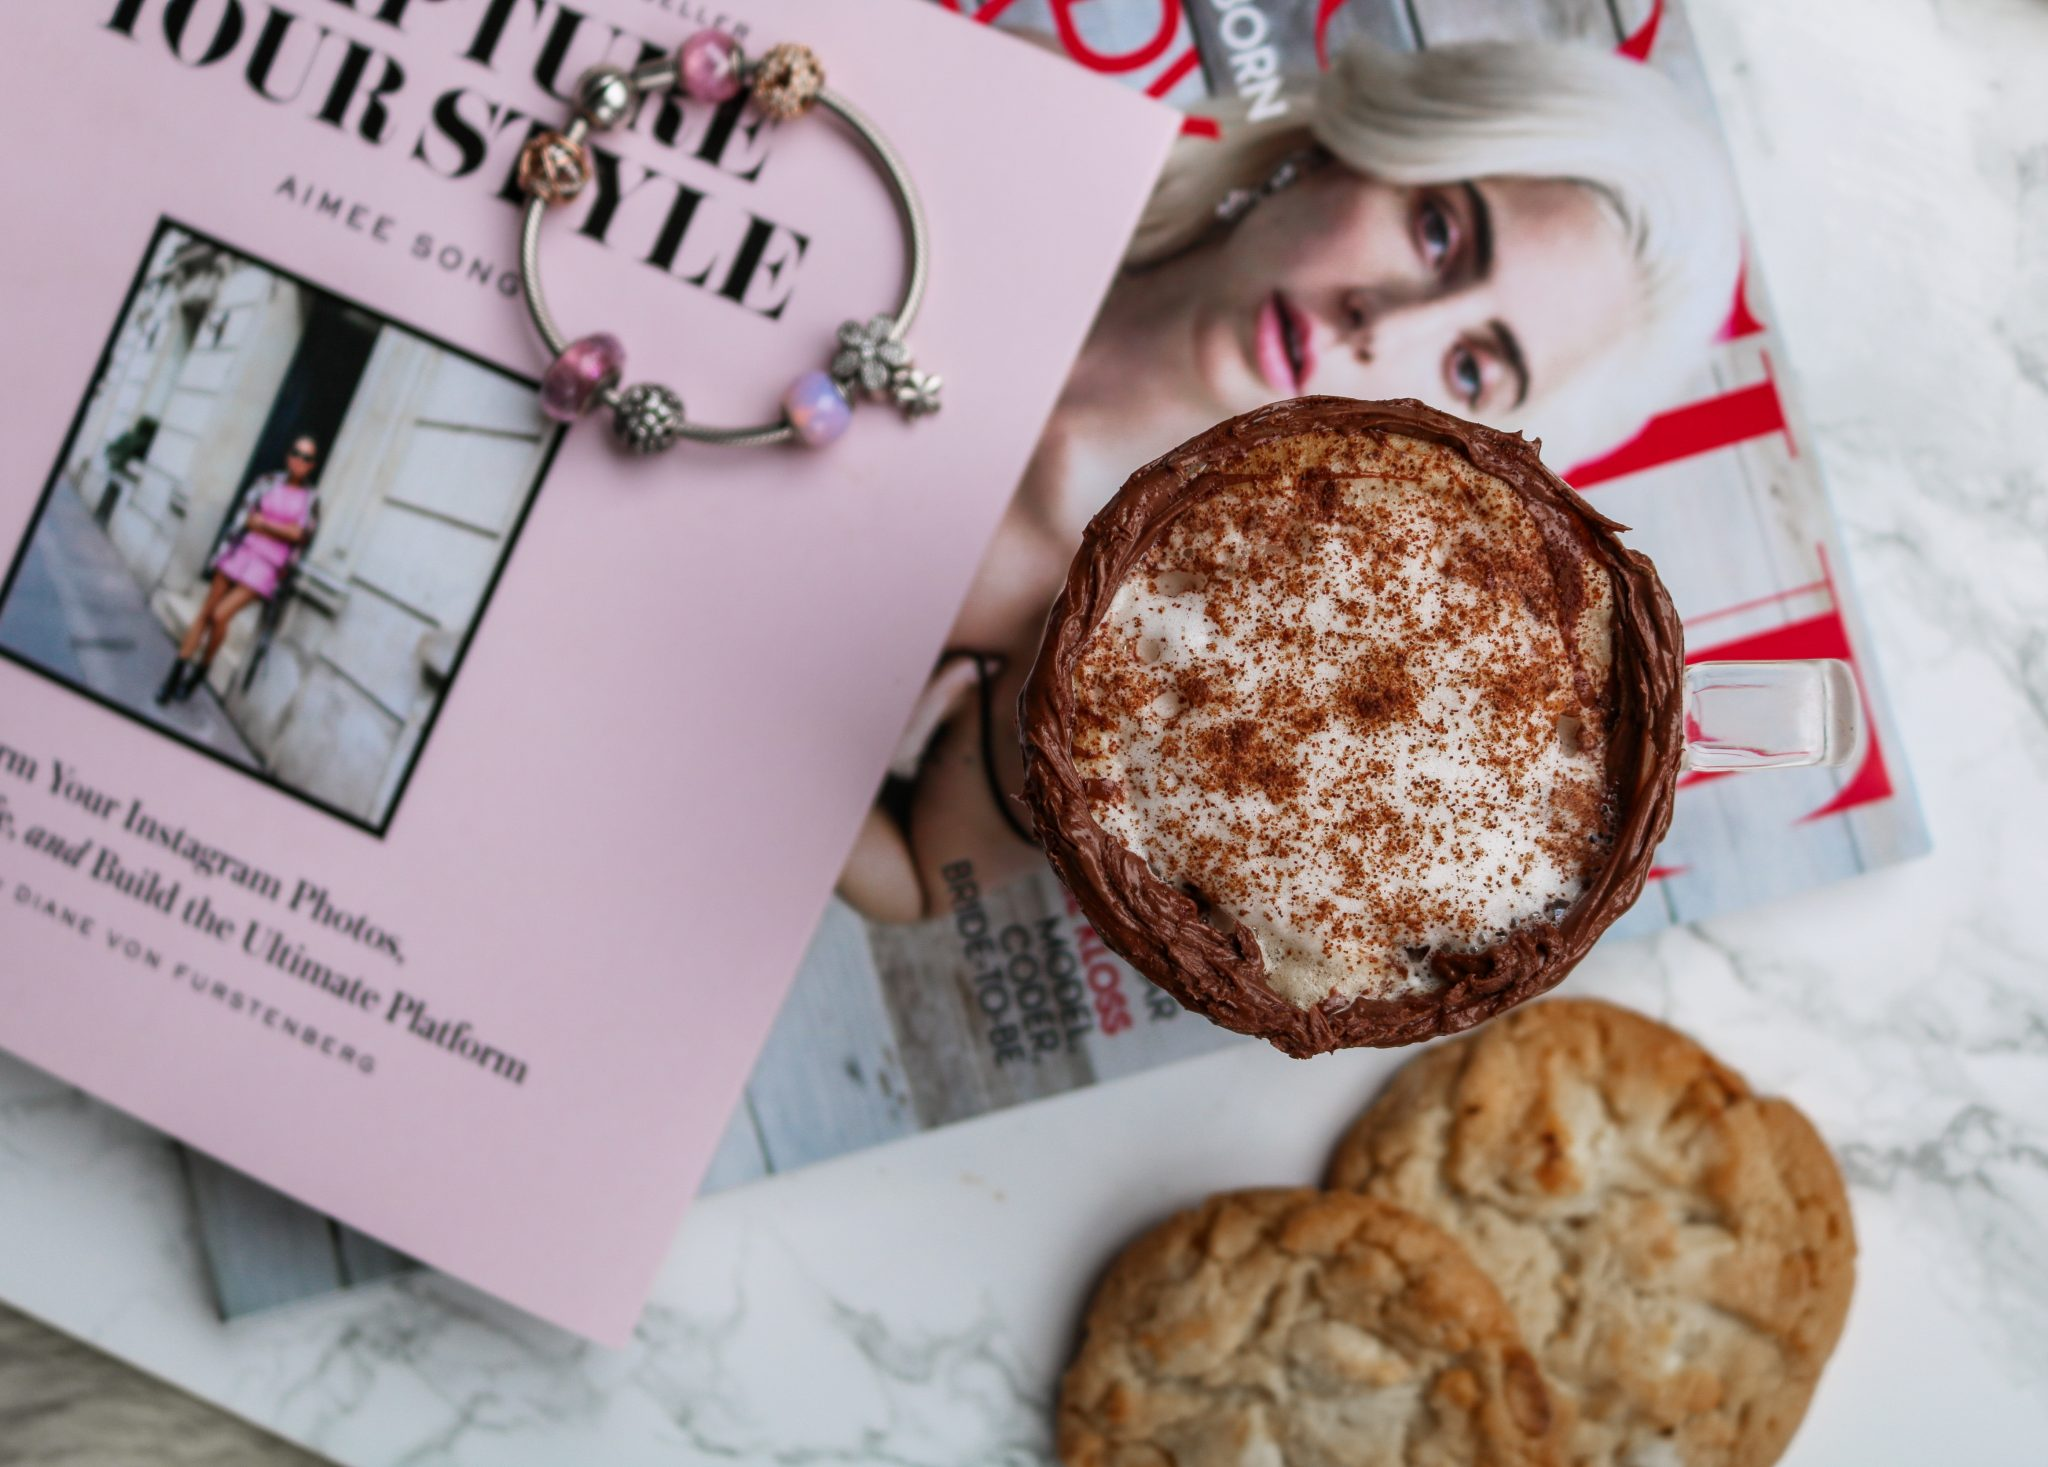 The-Hungarian-Brunette-Nutella-Latte-Recipe-2-of-5.jpg